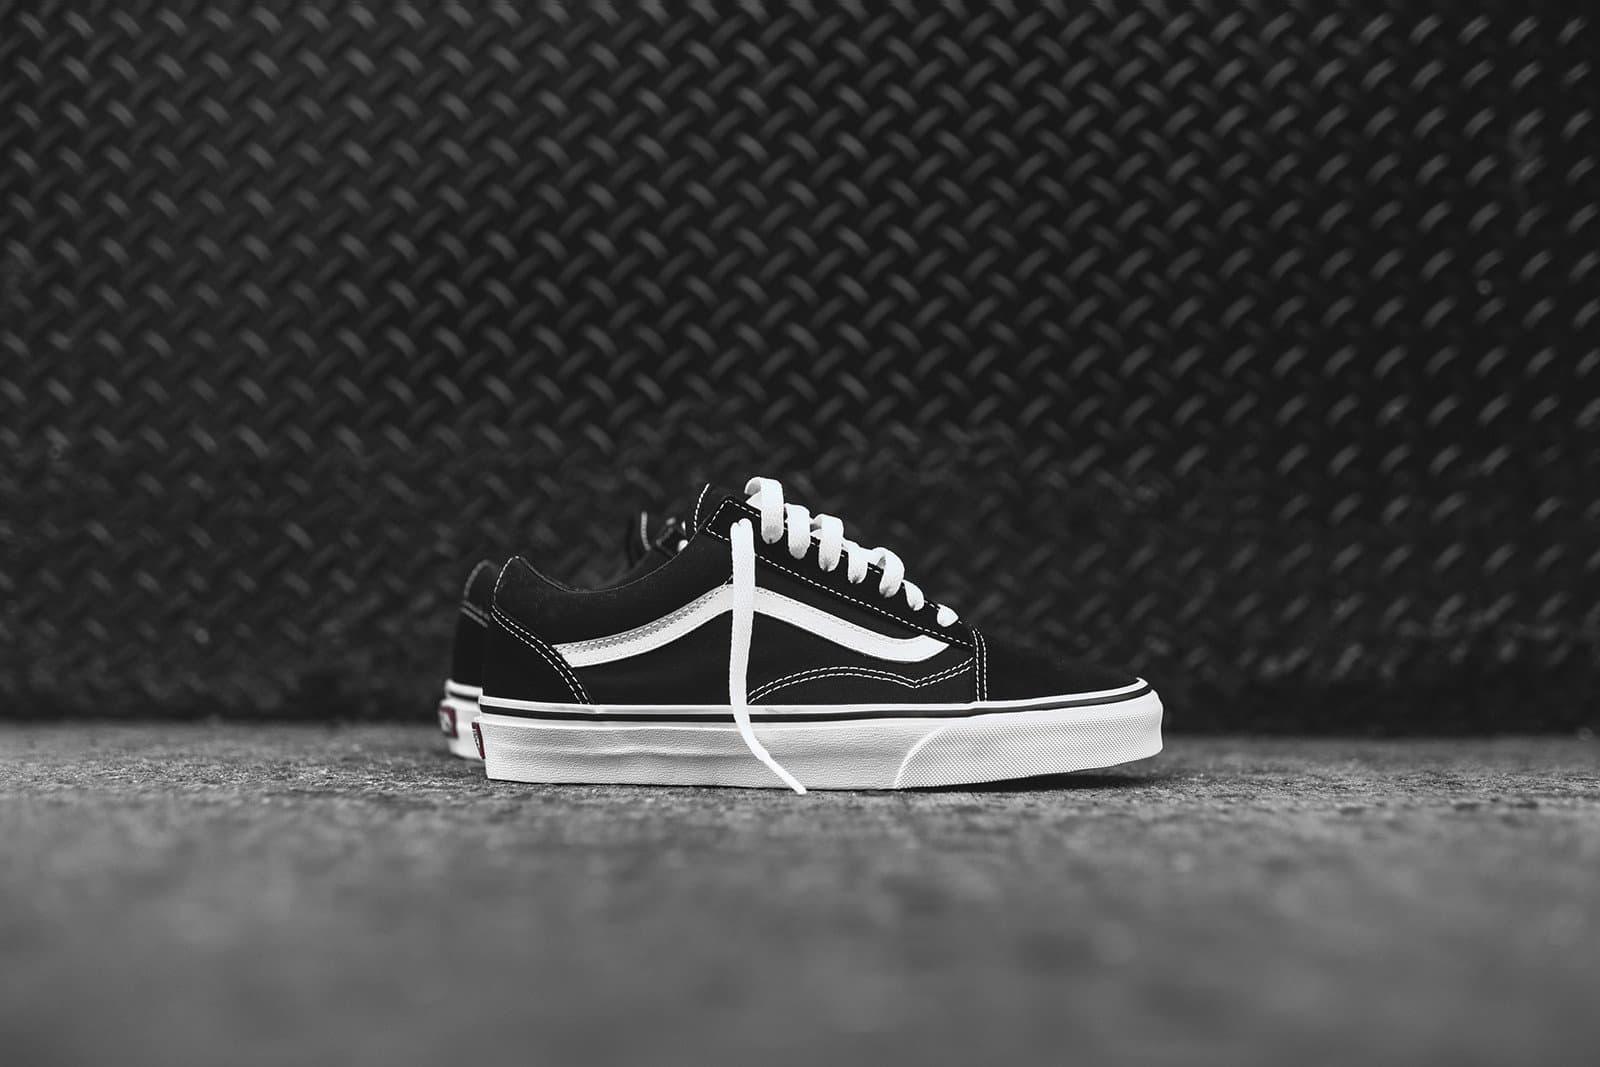 Jual sepatu vans classic old skool black white hitam putih dki jakarta velmond store tokopedia